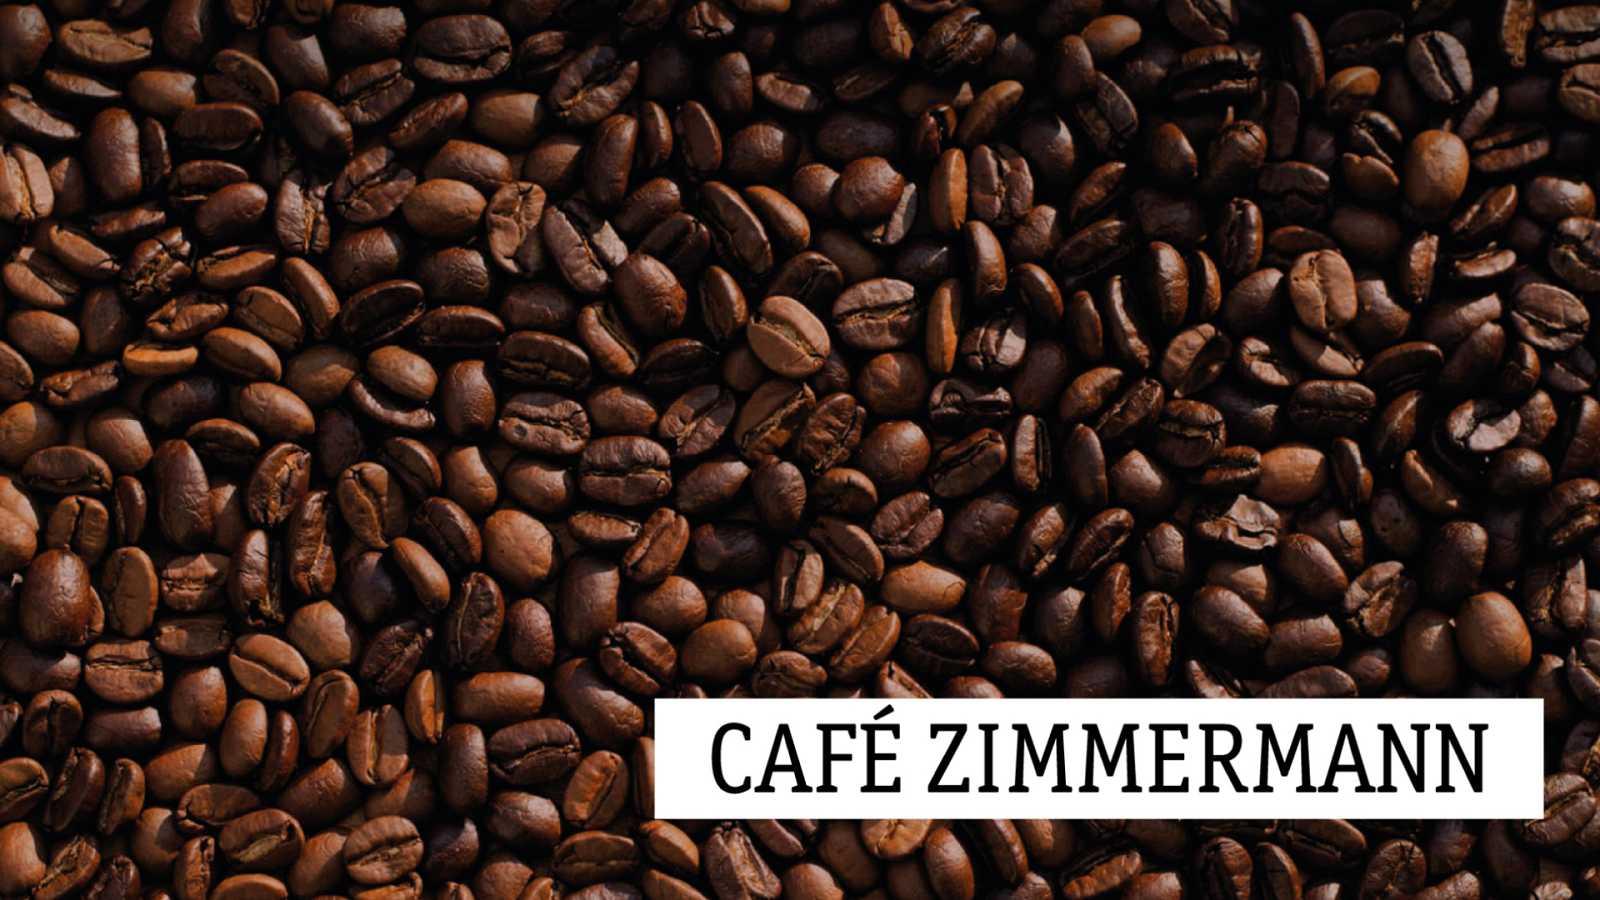 Café Zimmermann - Paula Coronas - 13/12/19 - escuchar ahora